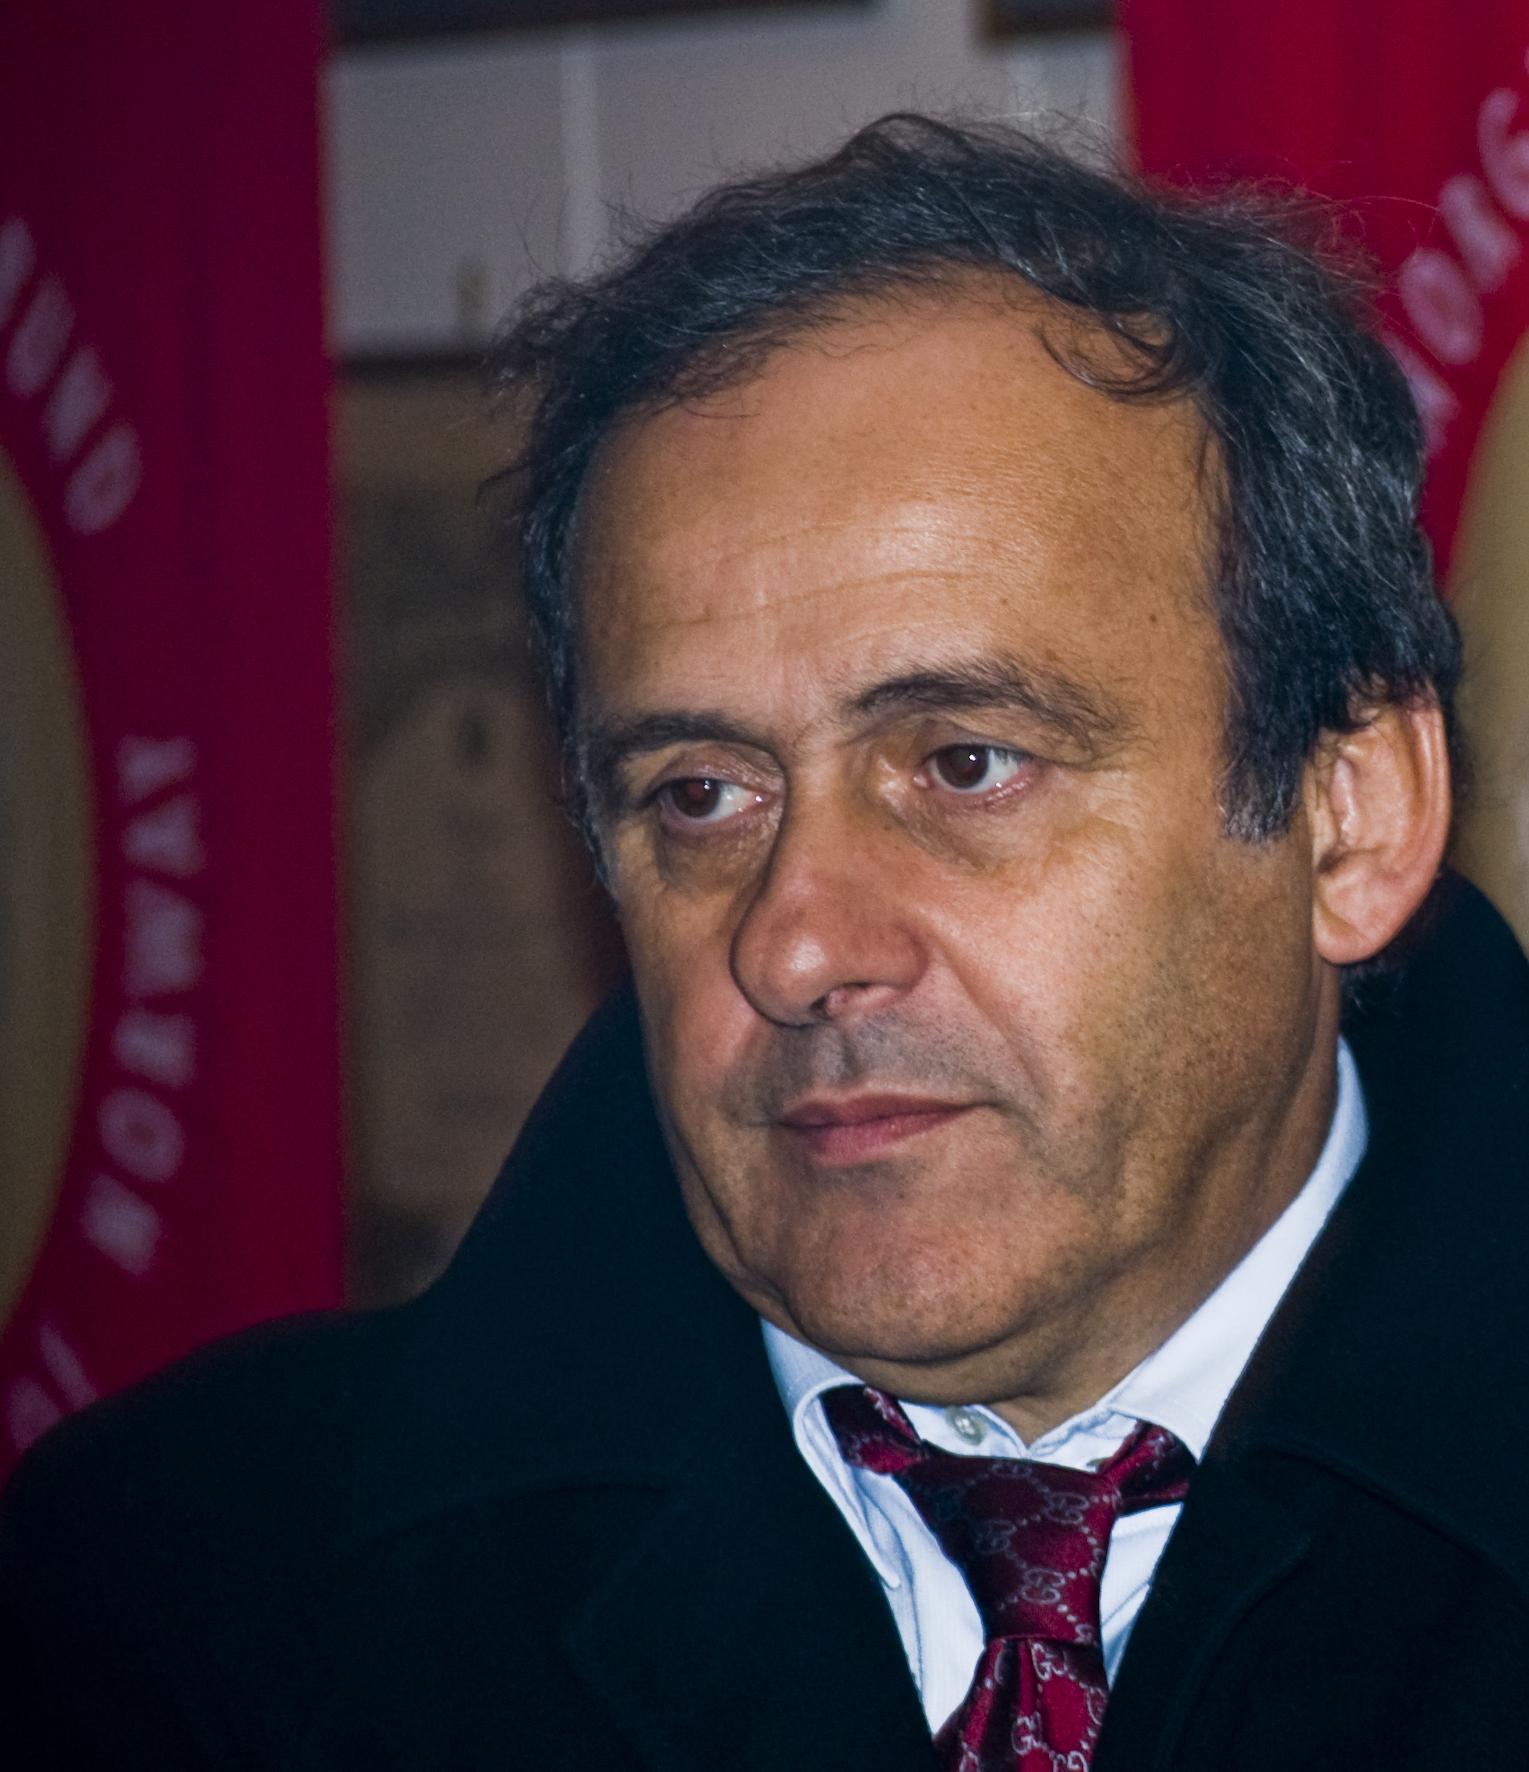 Michel Platini salary